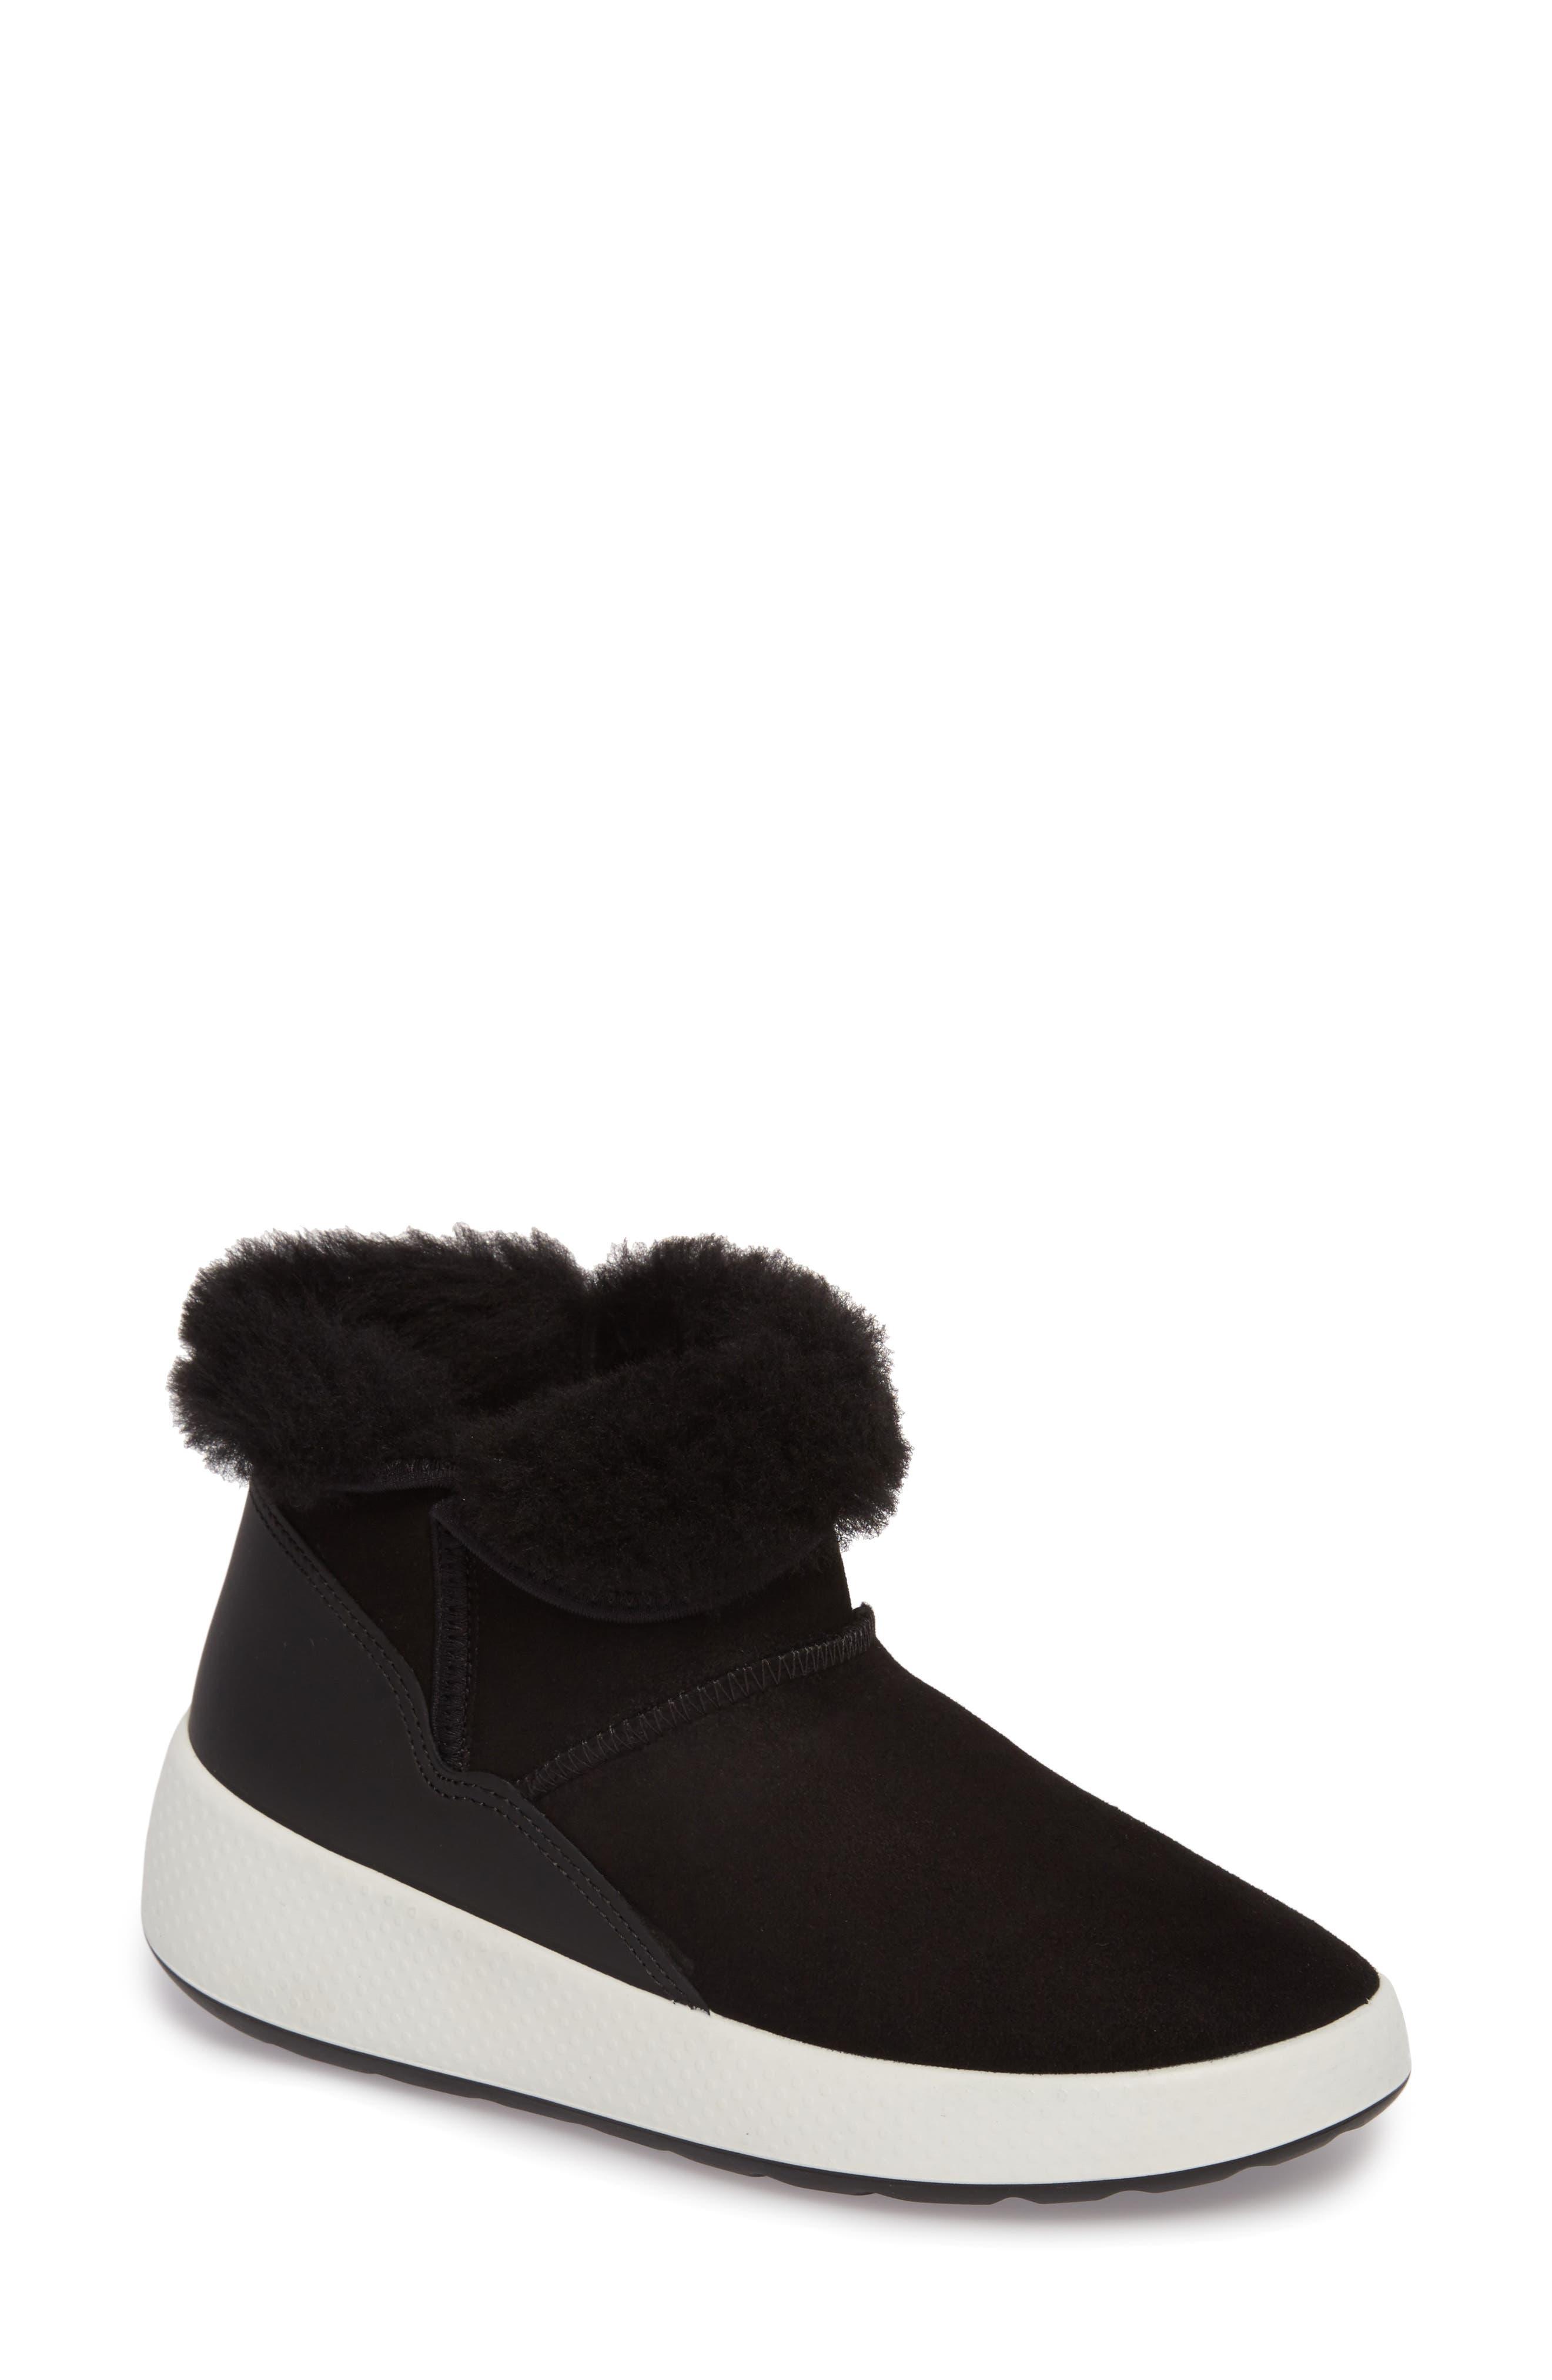 Ukiuk Genuine Shearling Boot,                             Main thumbnail 1, color,                             Black Leather